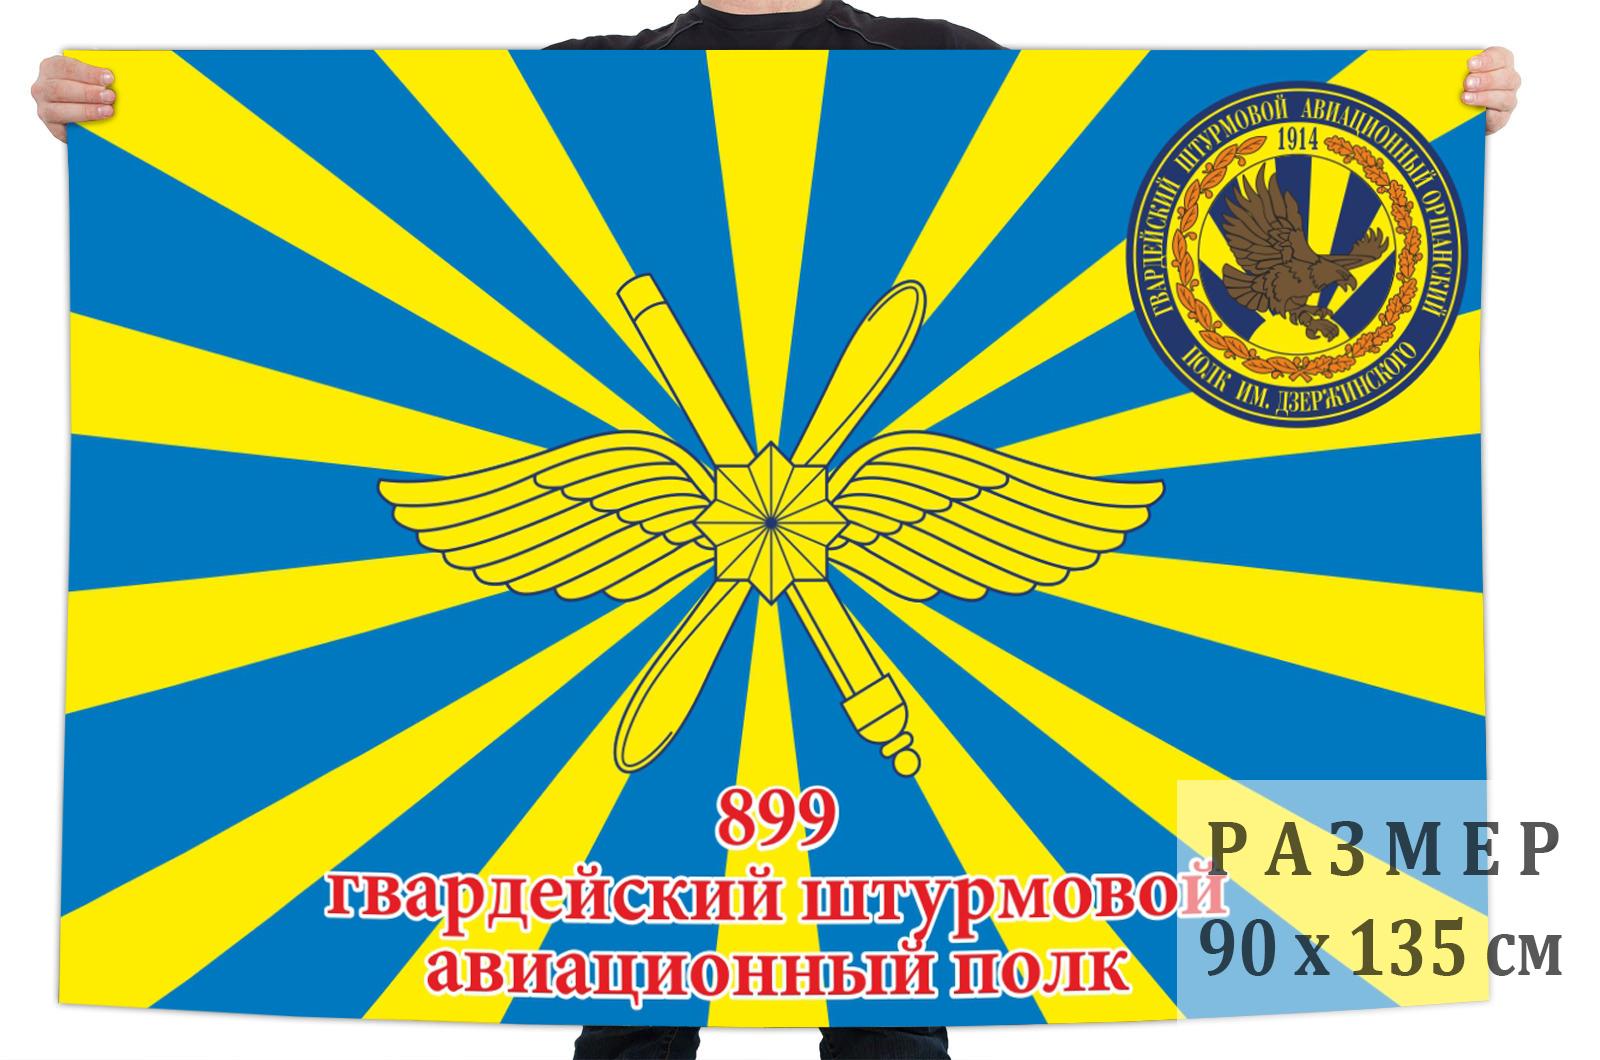 Флаг 899 гвардейского штурмового авиационного полка